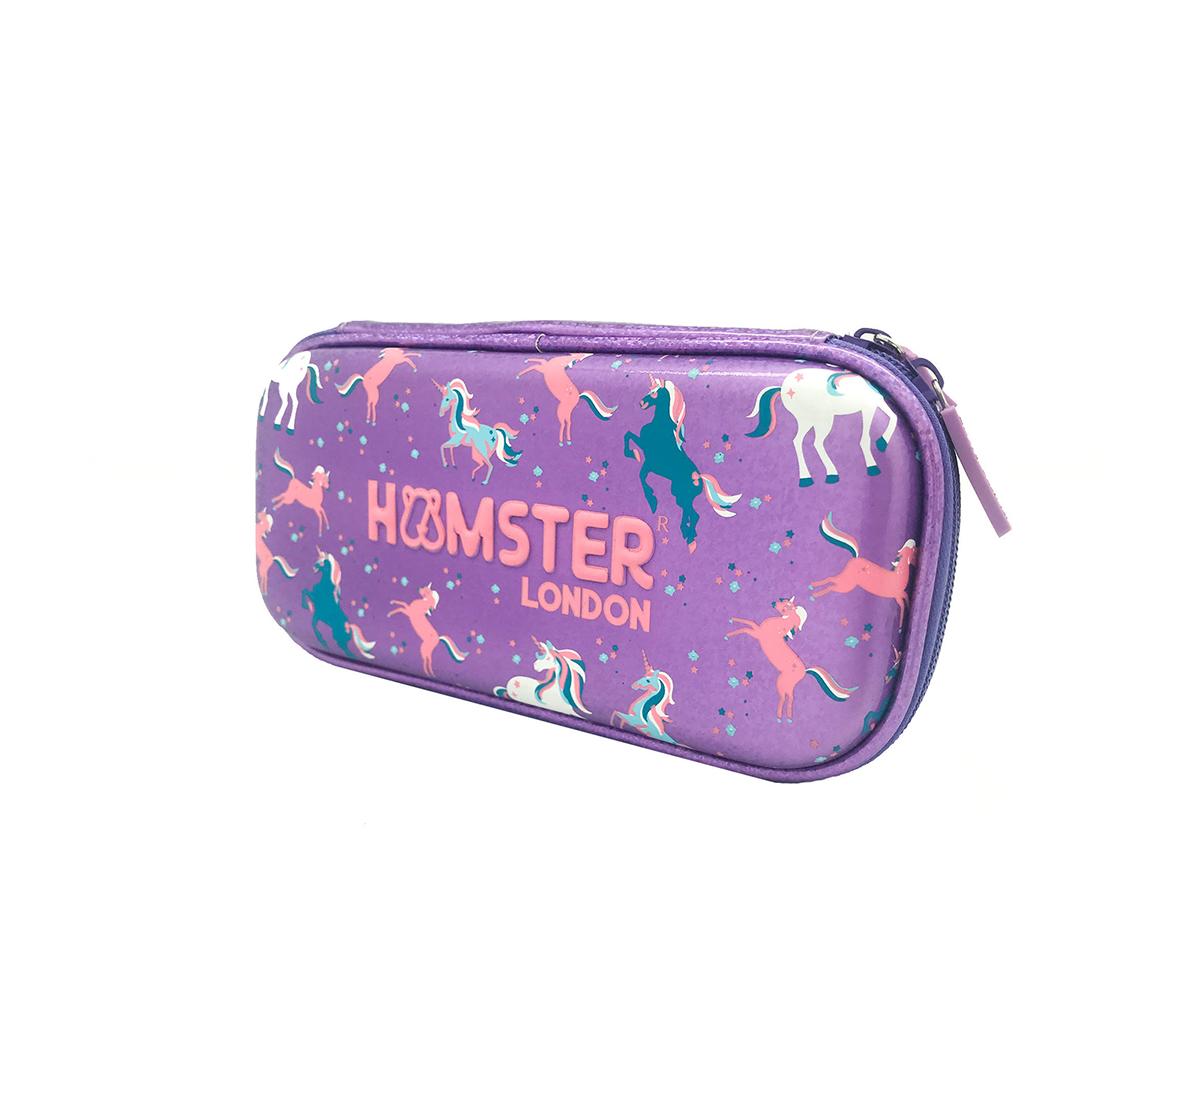 Hamster London | Hamster London Small Unicorn Stationery Hardcase for Girls age 3Y+ (Purple)